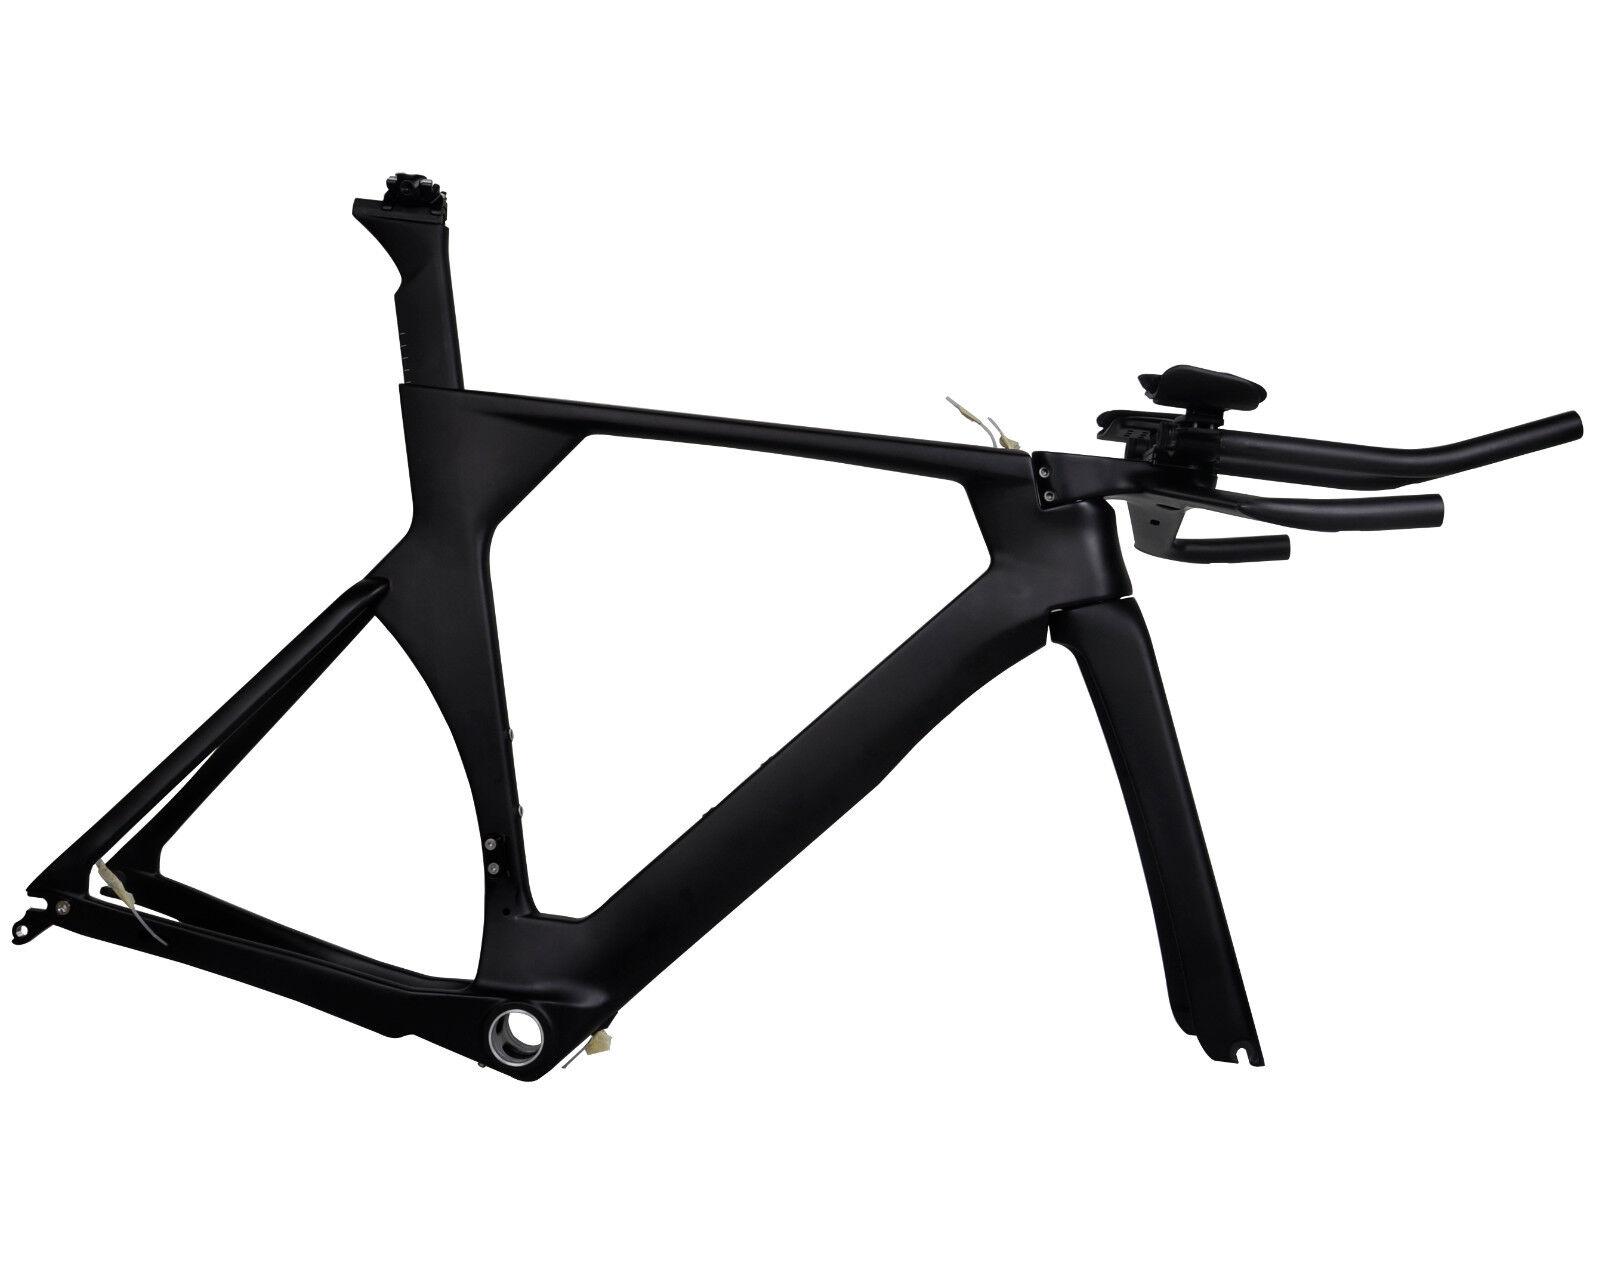 56cm Carbon Time Trial Bike Frame Fork Handlebar UD Matt Triathlon TT BSA PF30